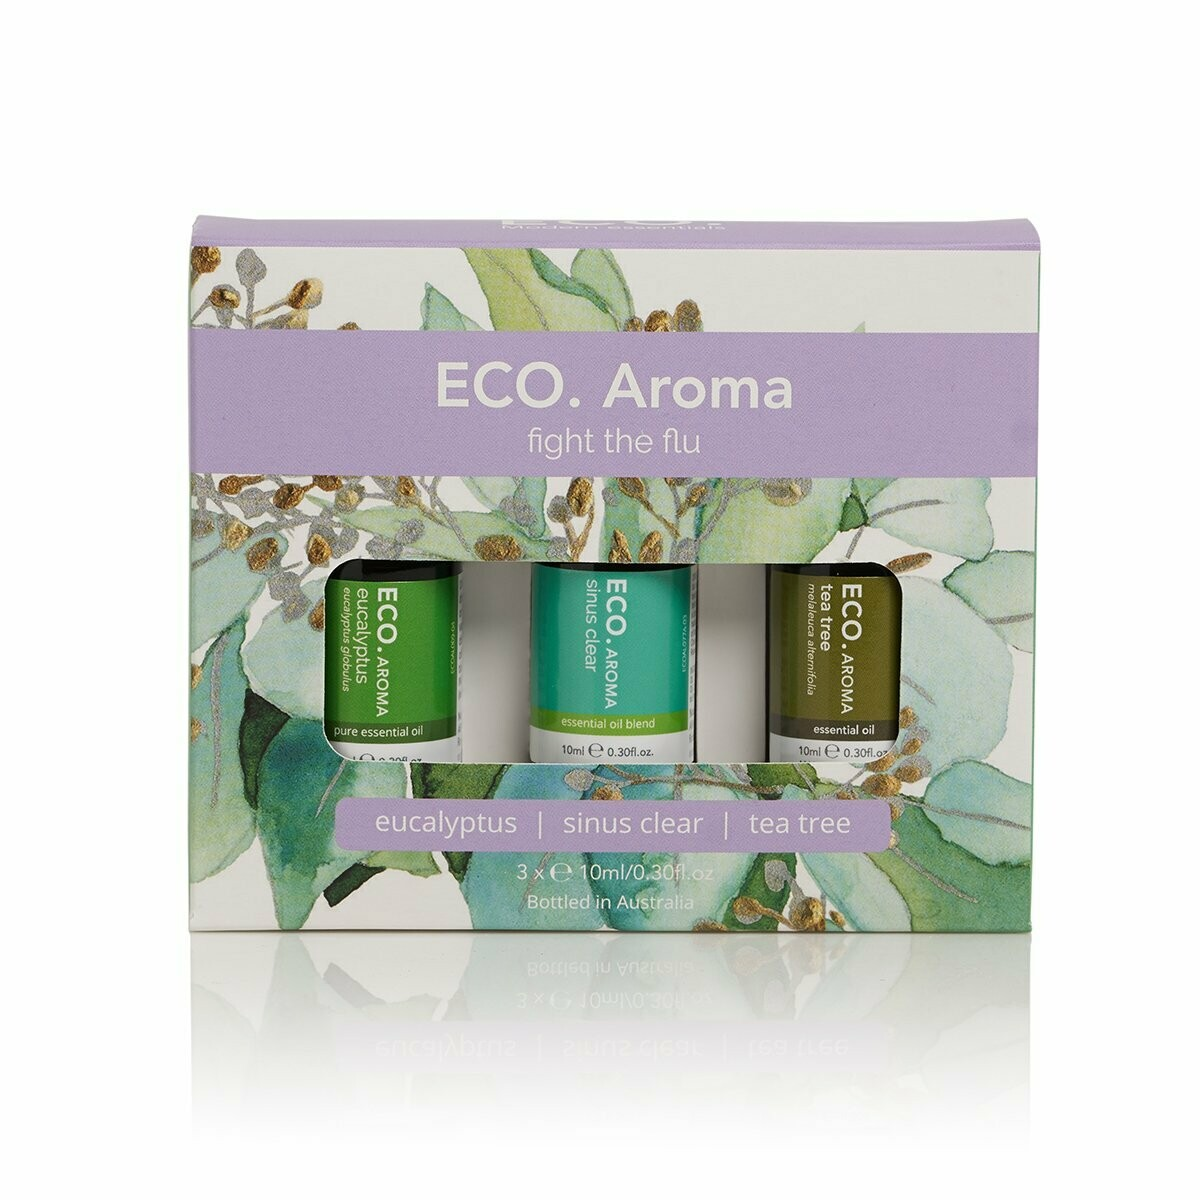 ECO. Fight the Flu Aroma Trio (Eucalyptus, Sinus Clear, Tea Tree)